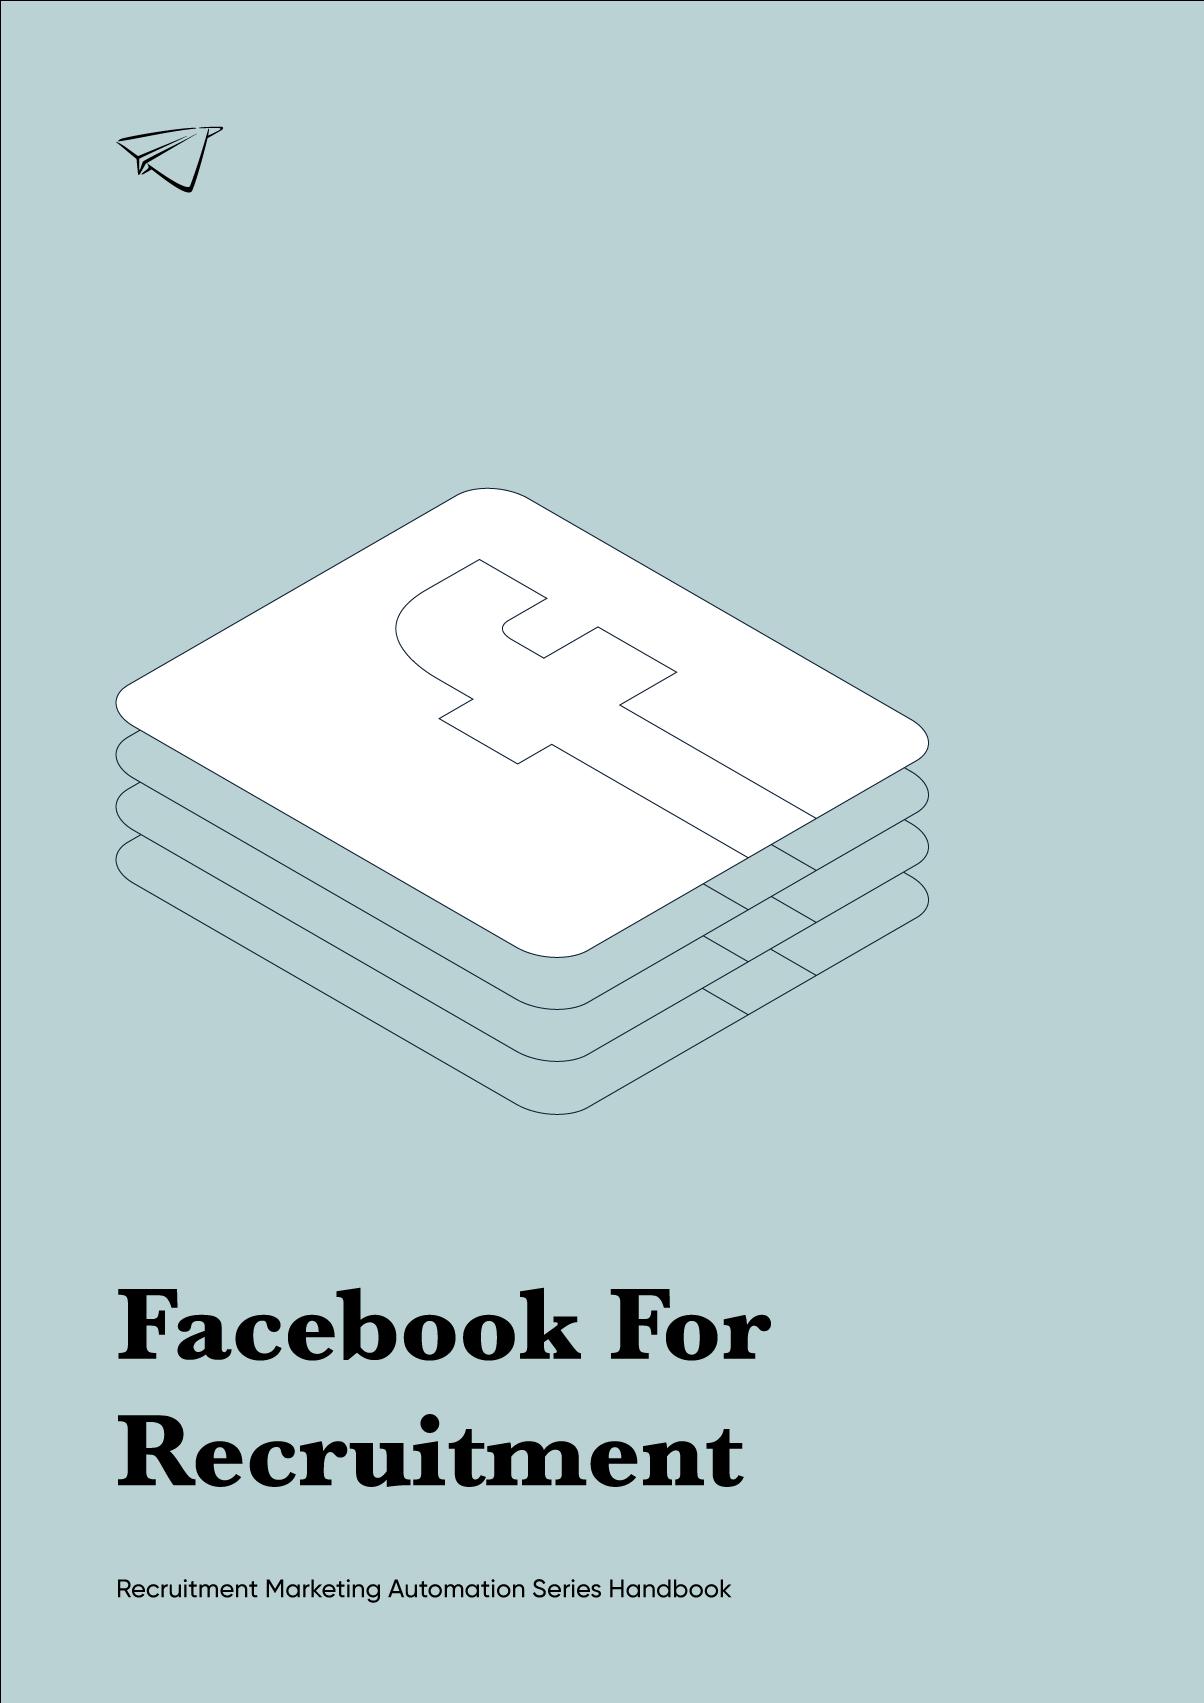 facebook-for-recruitment